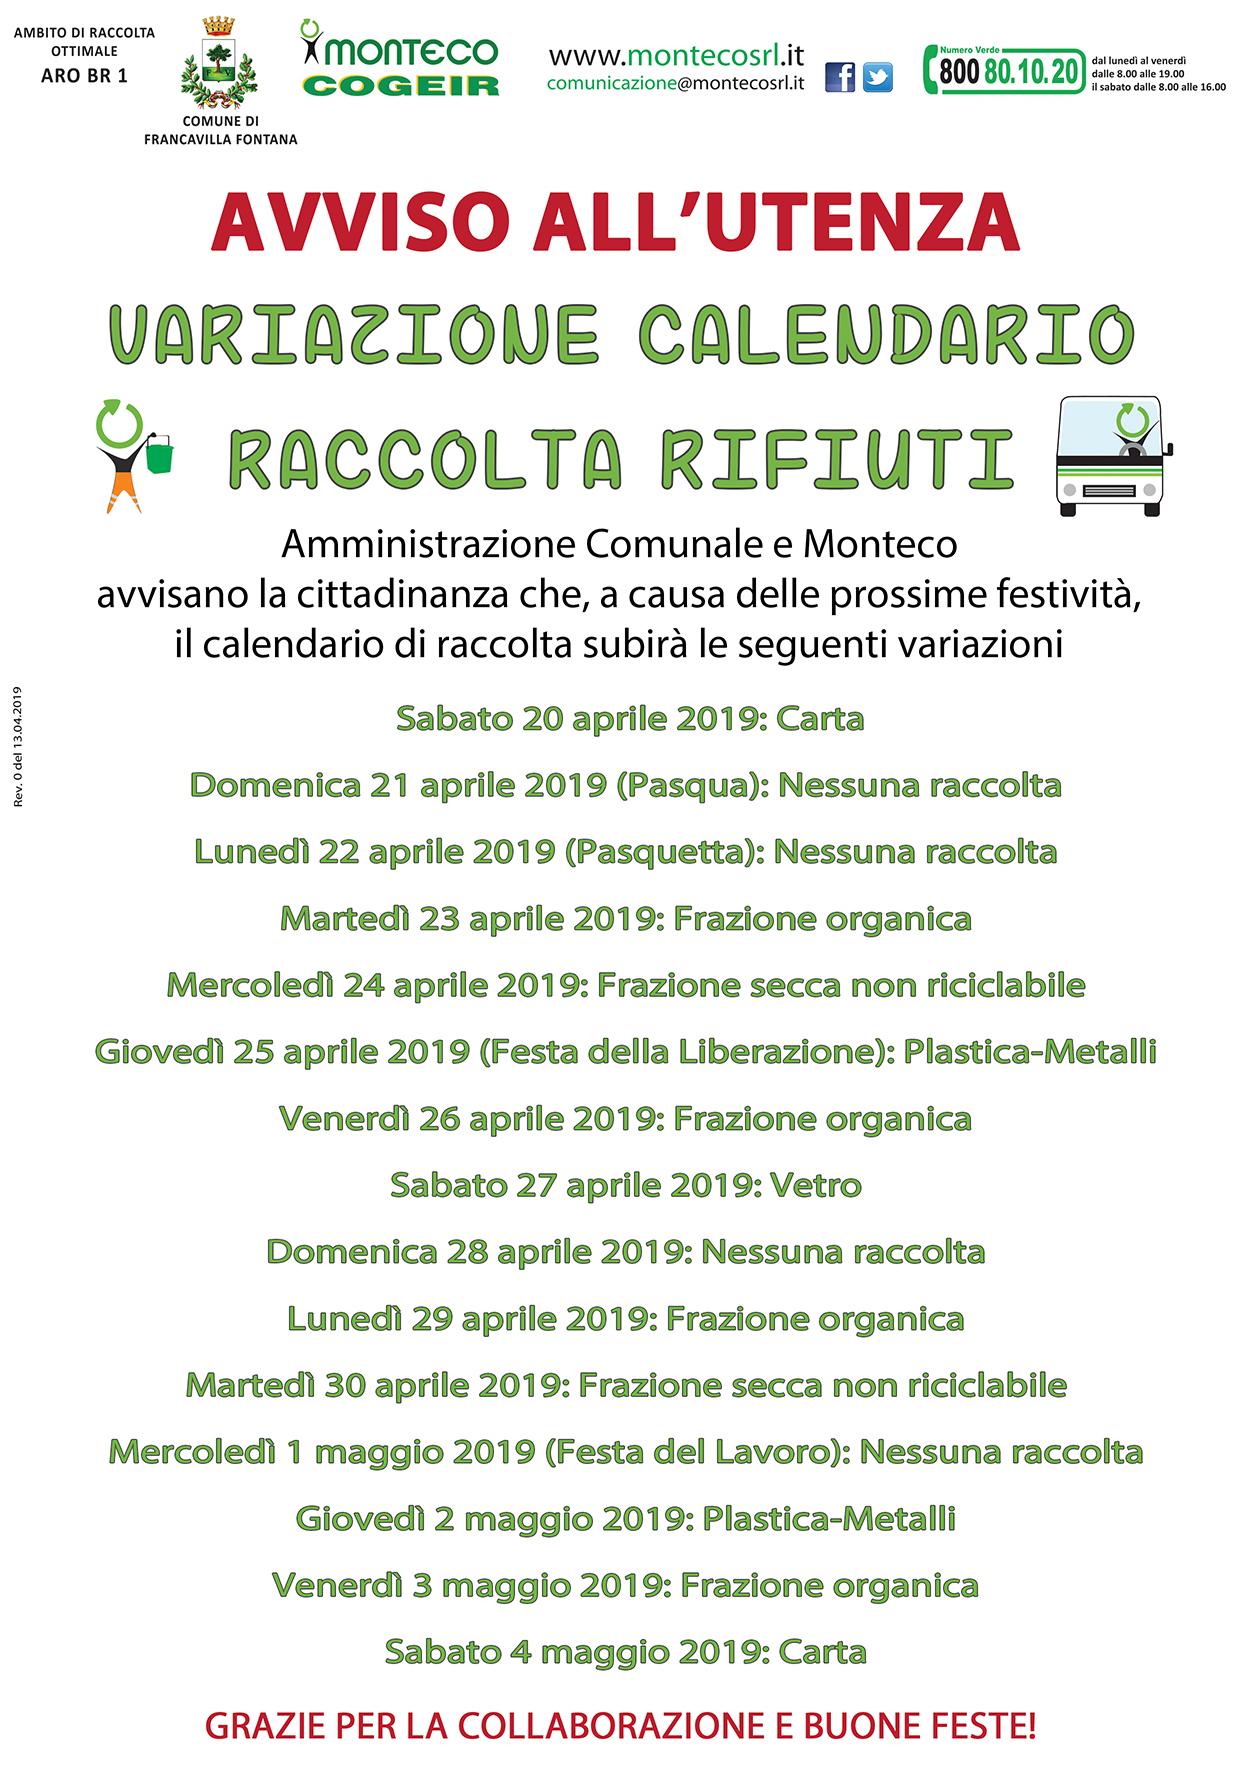 Calendario Feste.Francavilla Fontana Variazione Al Calendario Di Raccolta